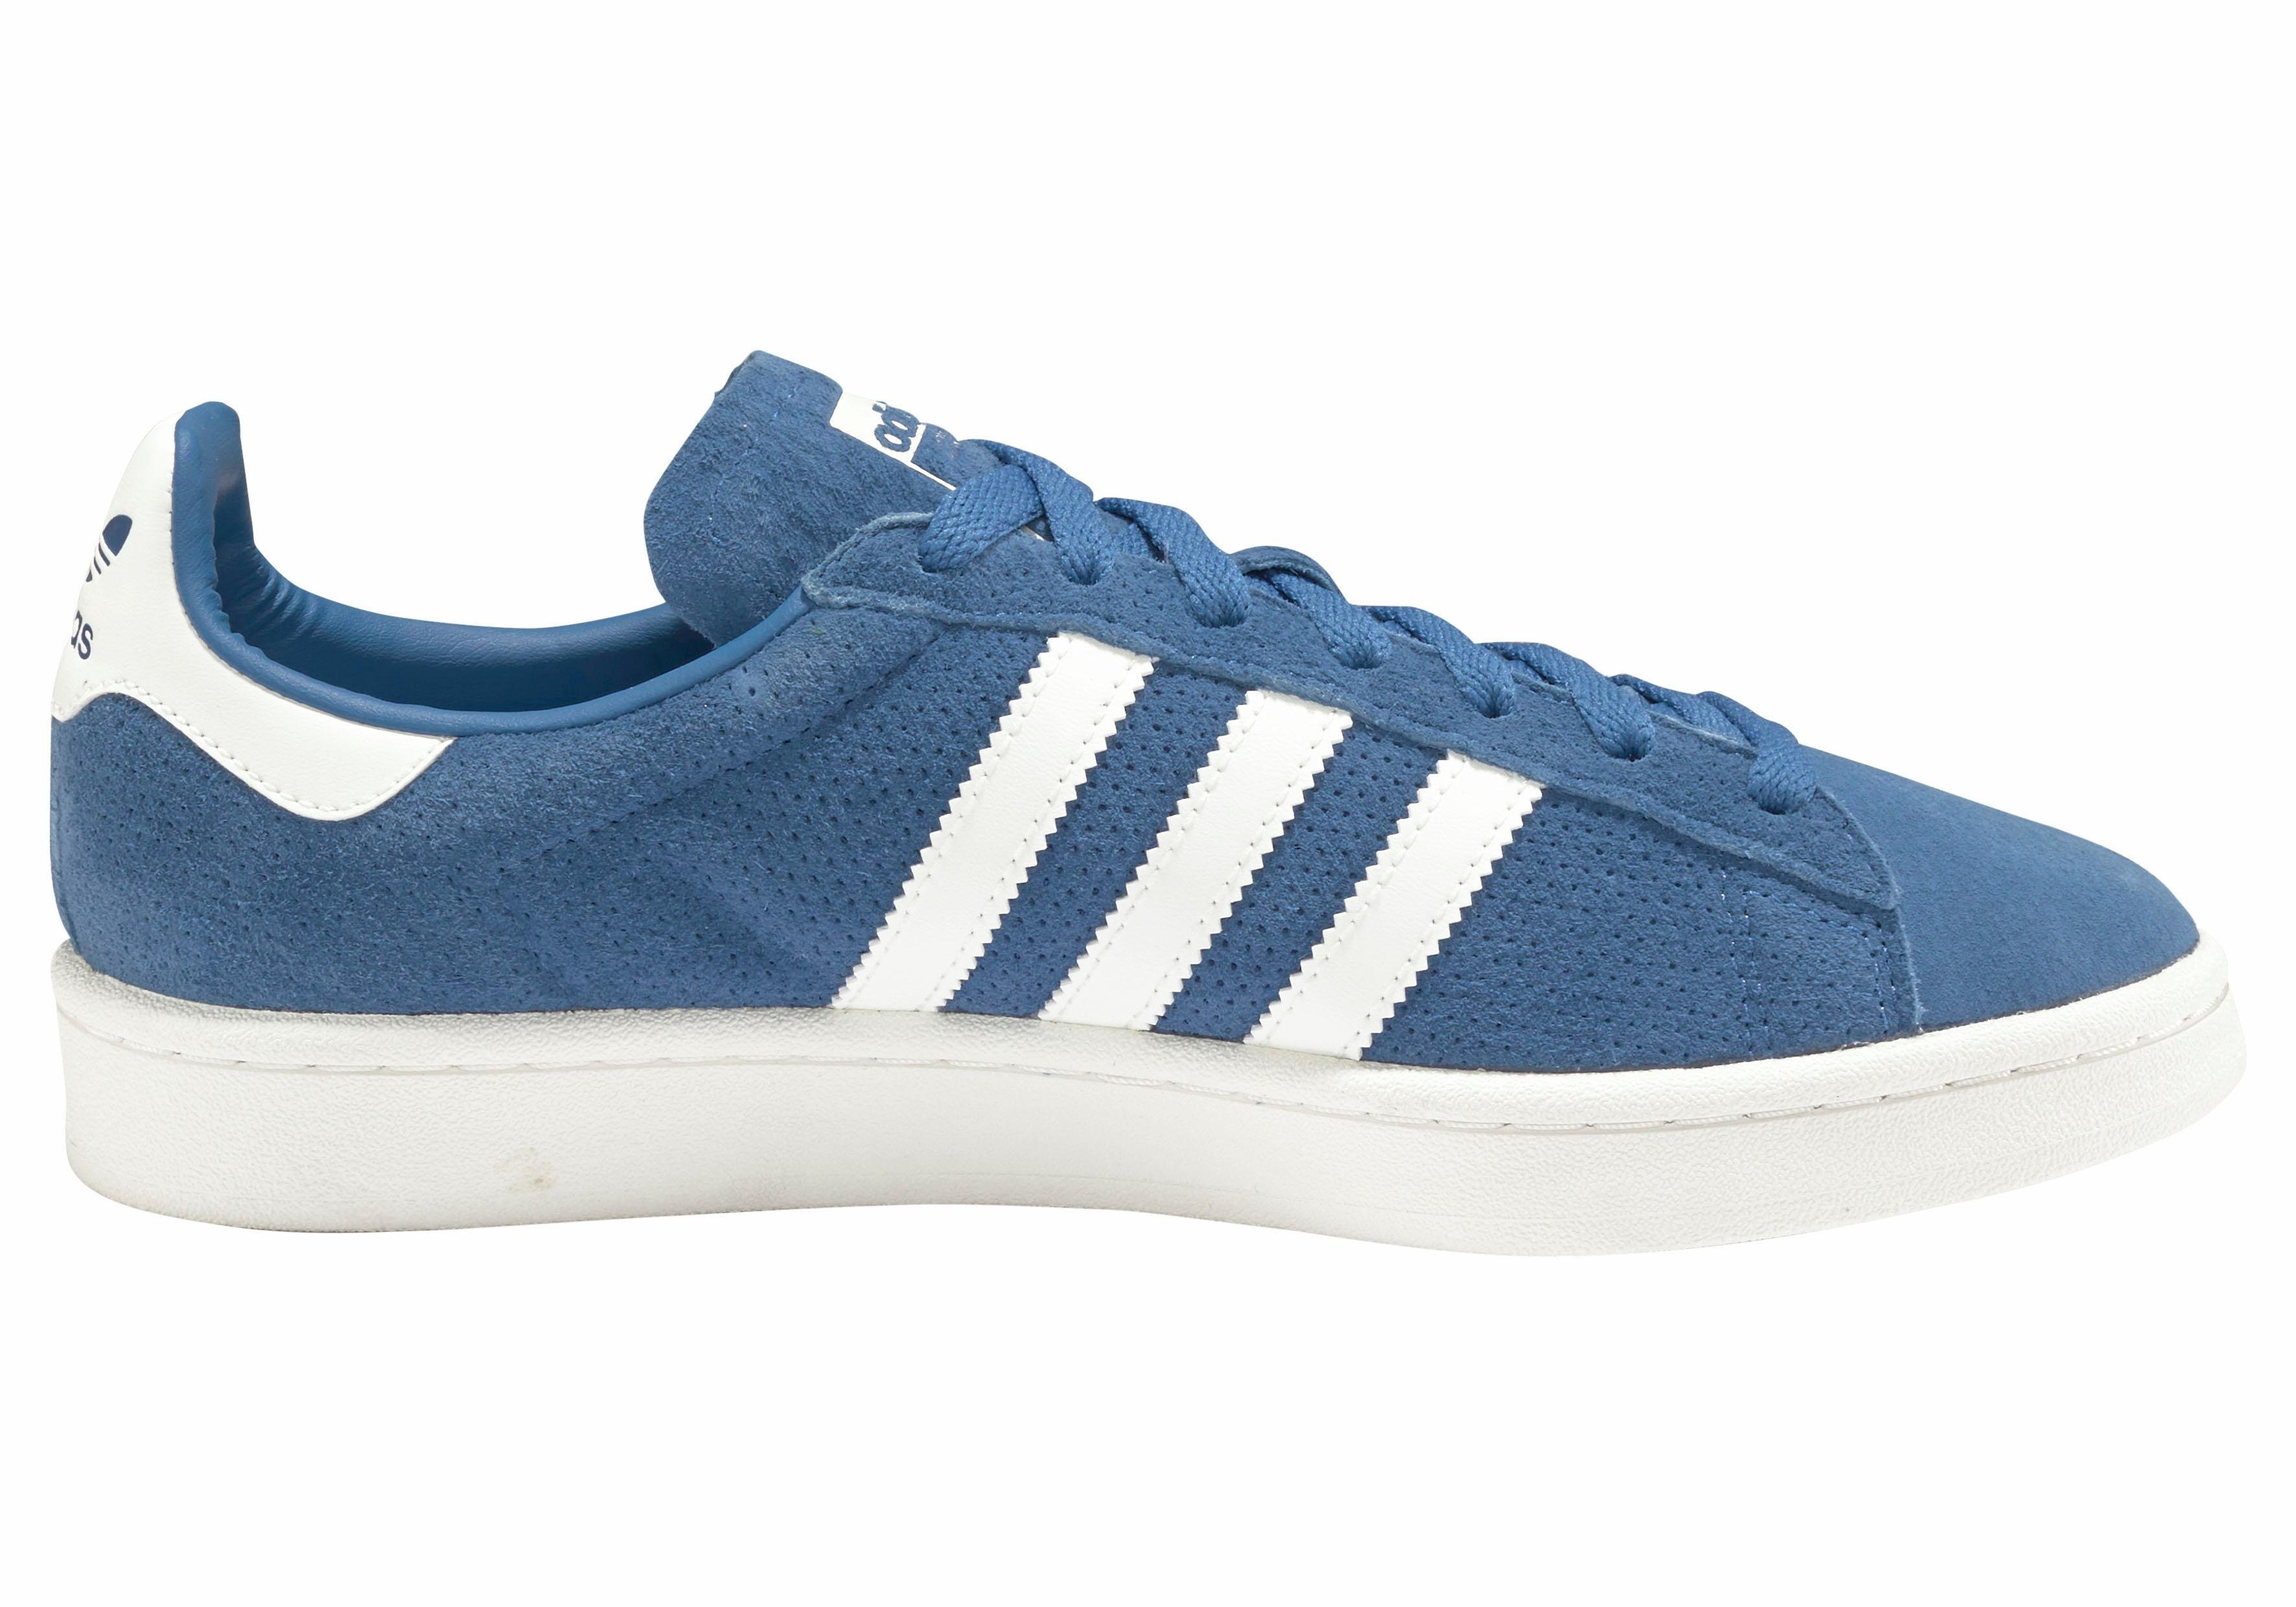 Sneakerscampus Adidas De In Originals Winkel Online R53AjL4